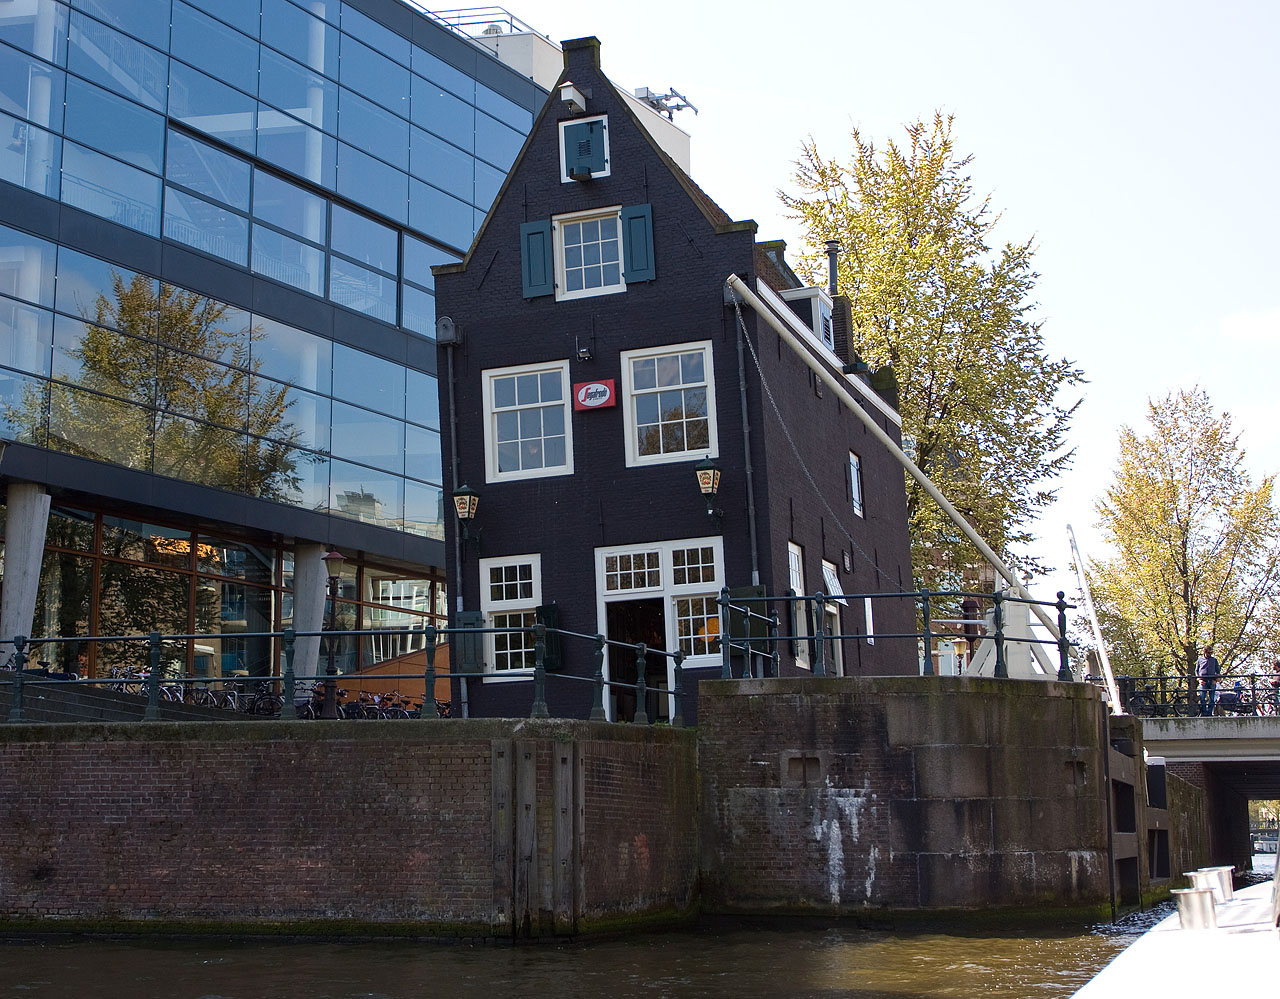 http://www.tunliweb.no/Bilder_SM/_album_amsterdam/c8.JPG